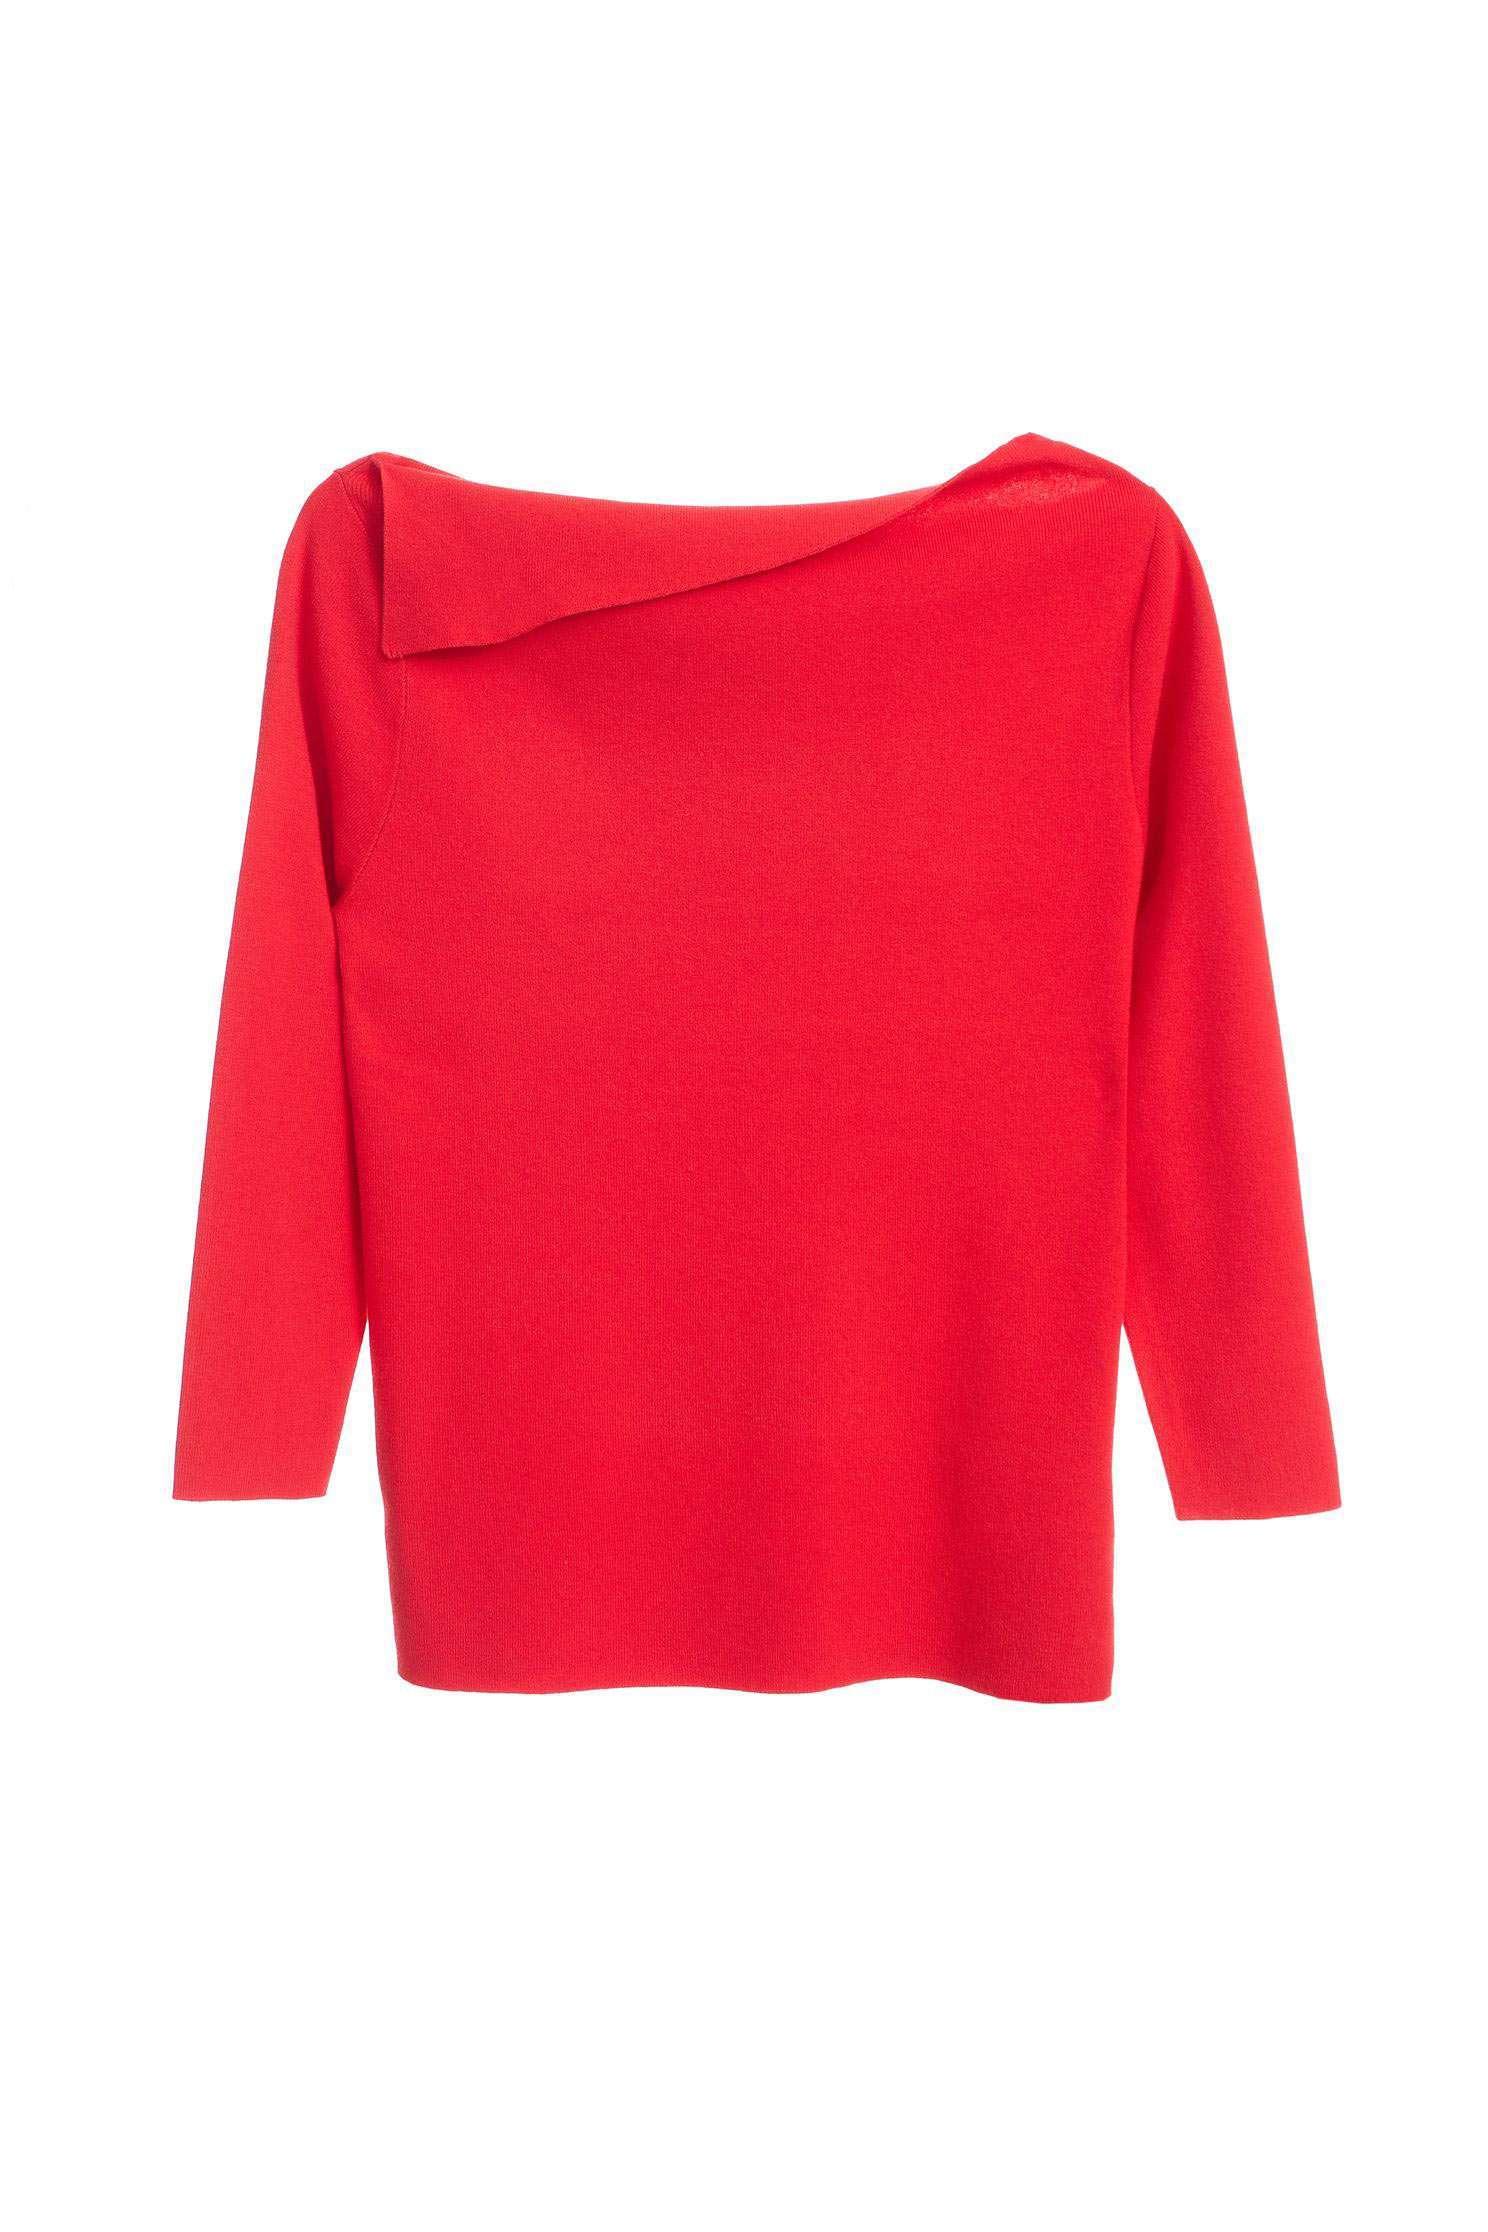 Slim sweater